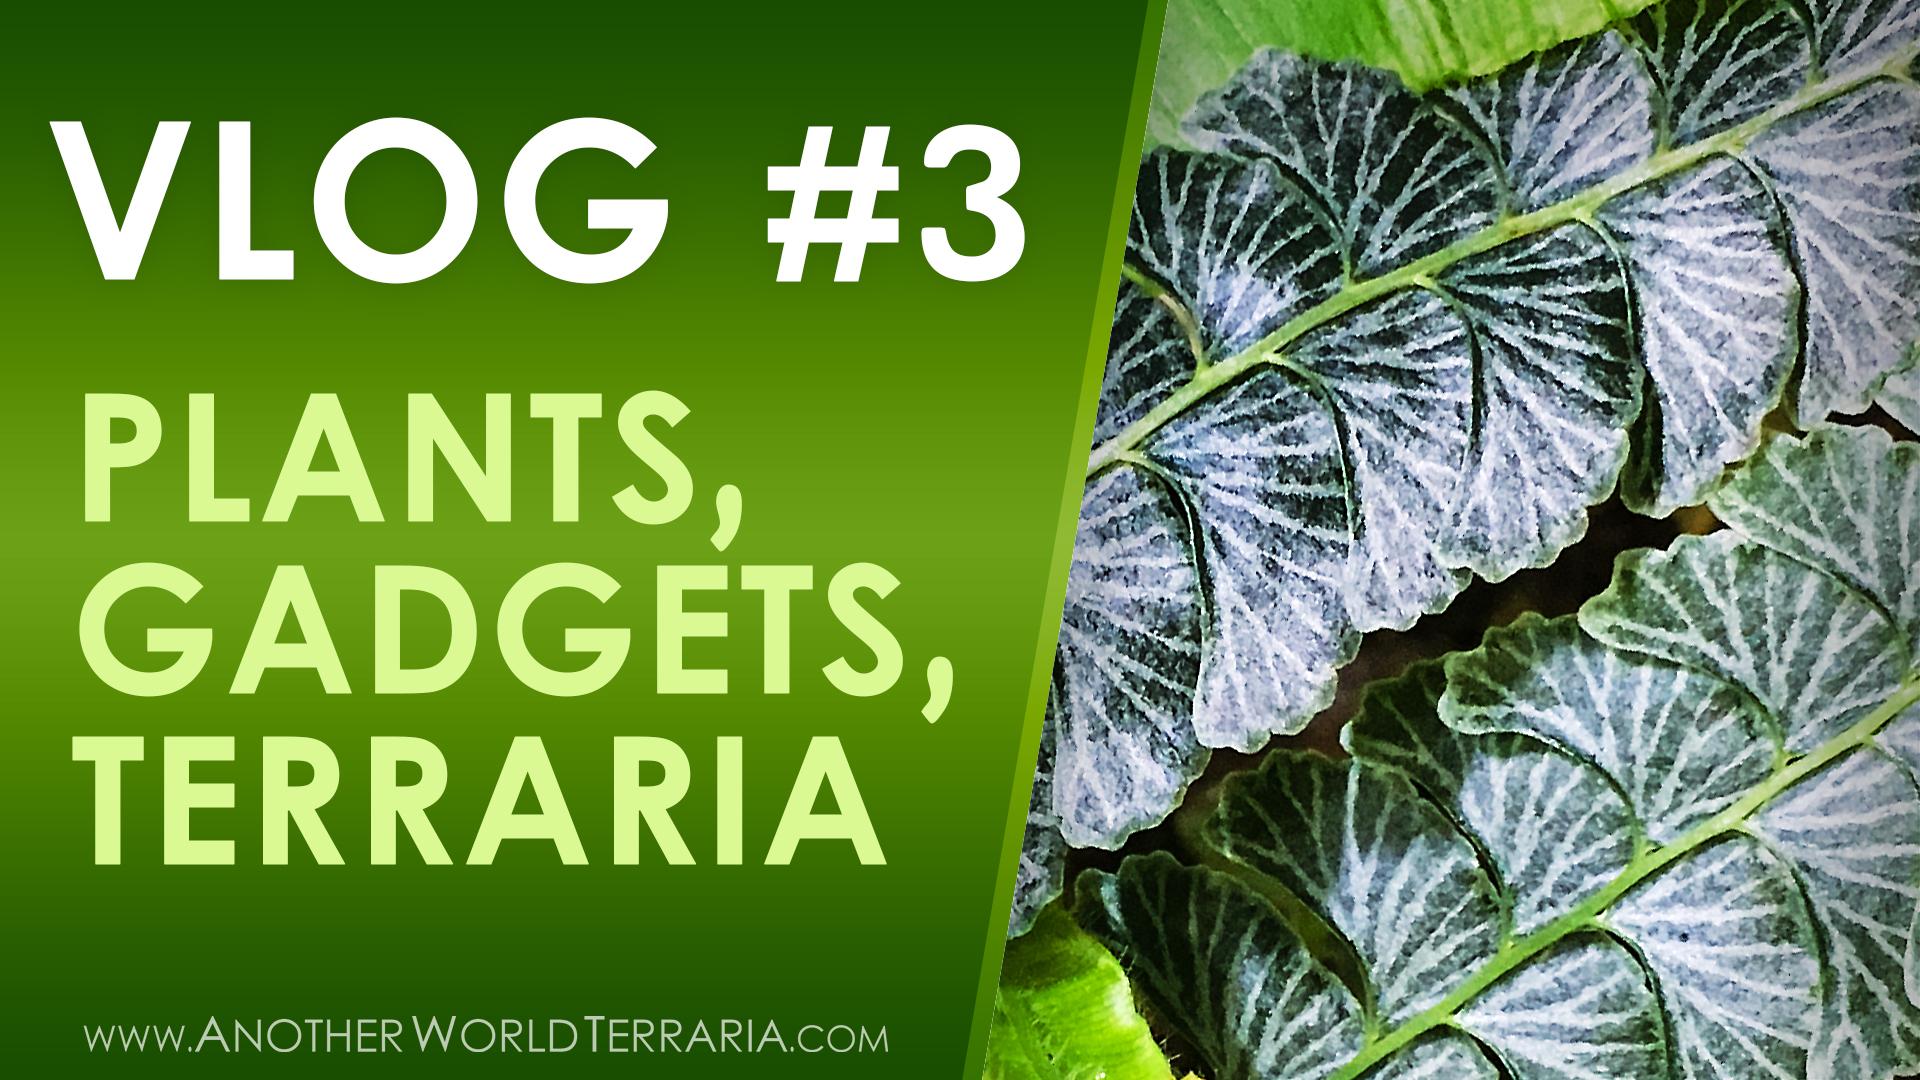 Vlog #3 – Plants, Gadgets, Brancharium (and more!)